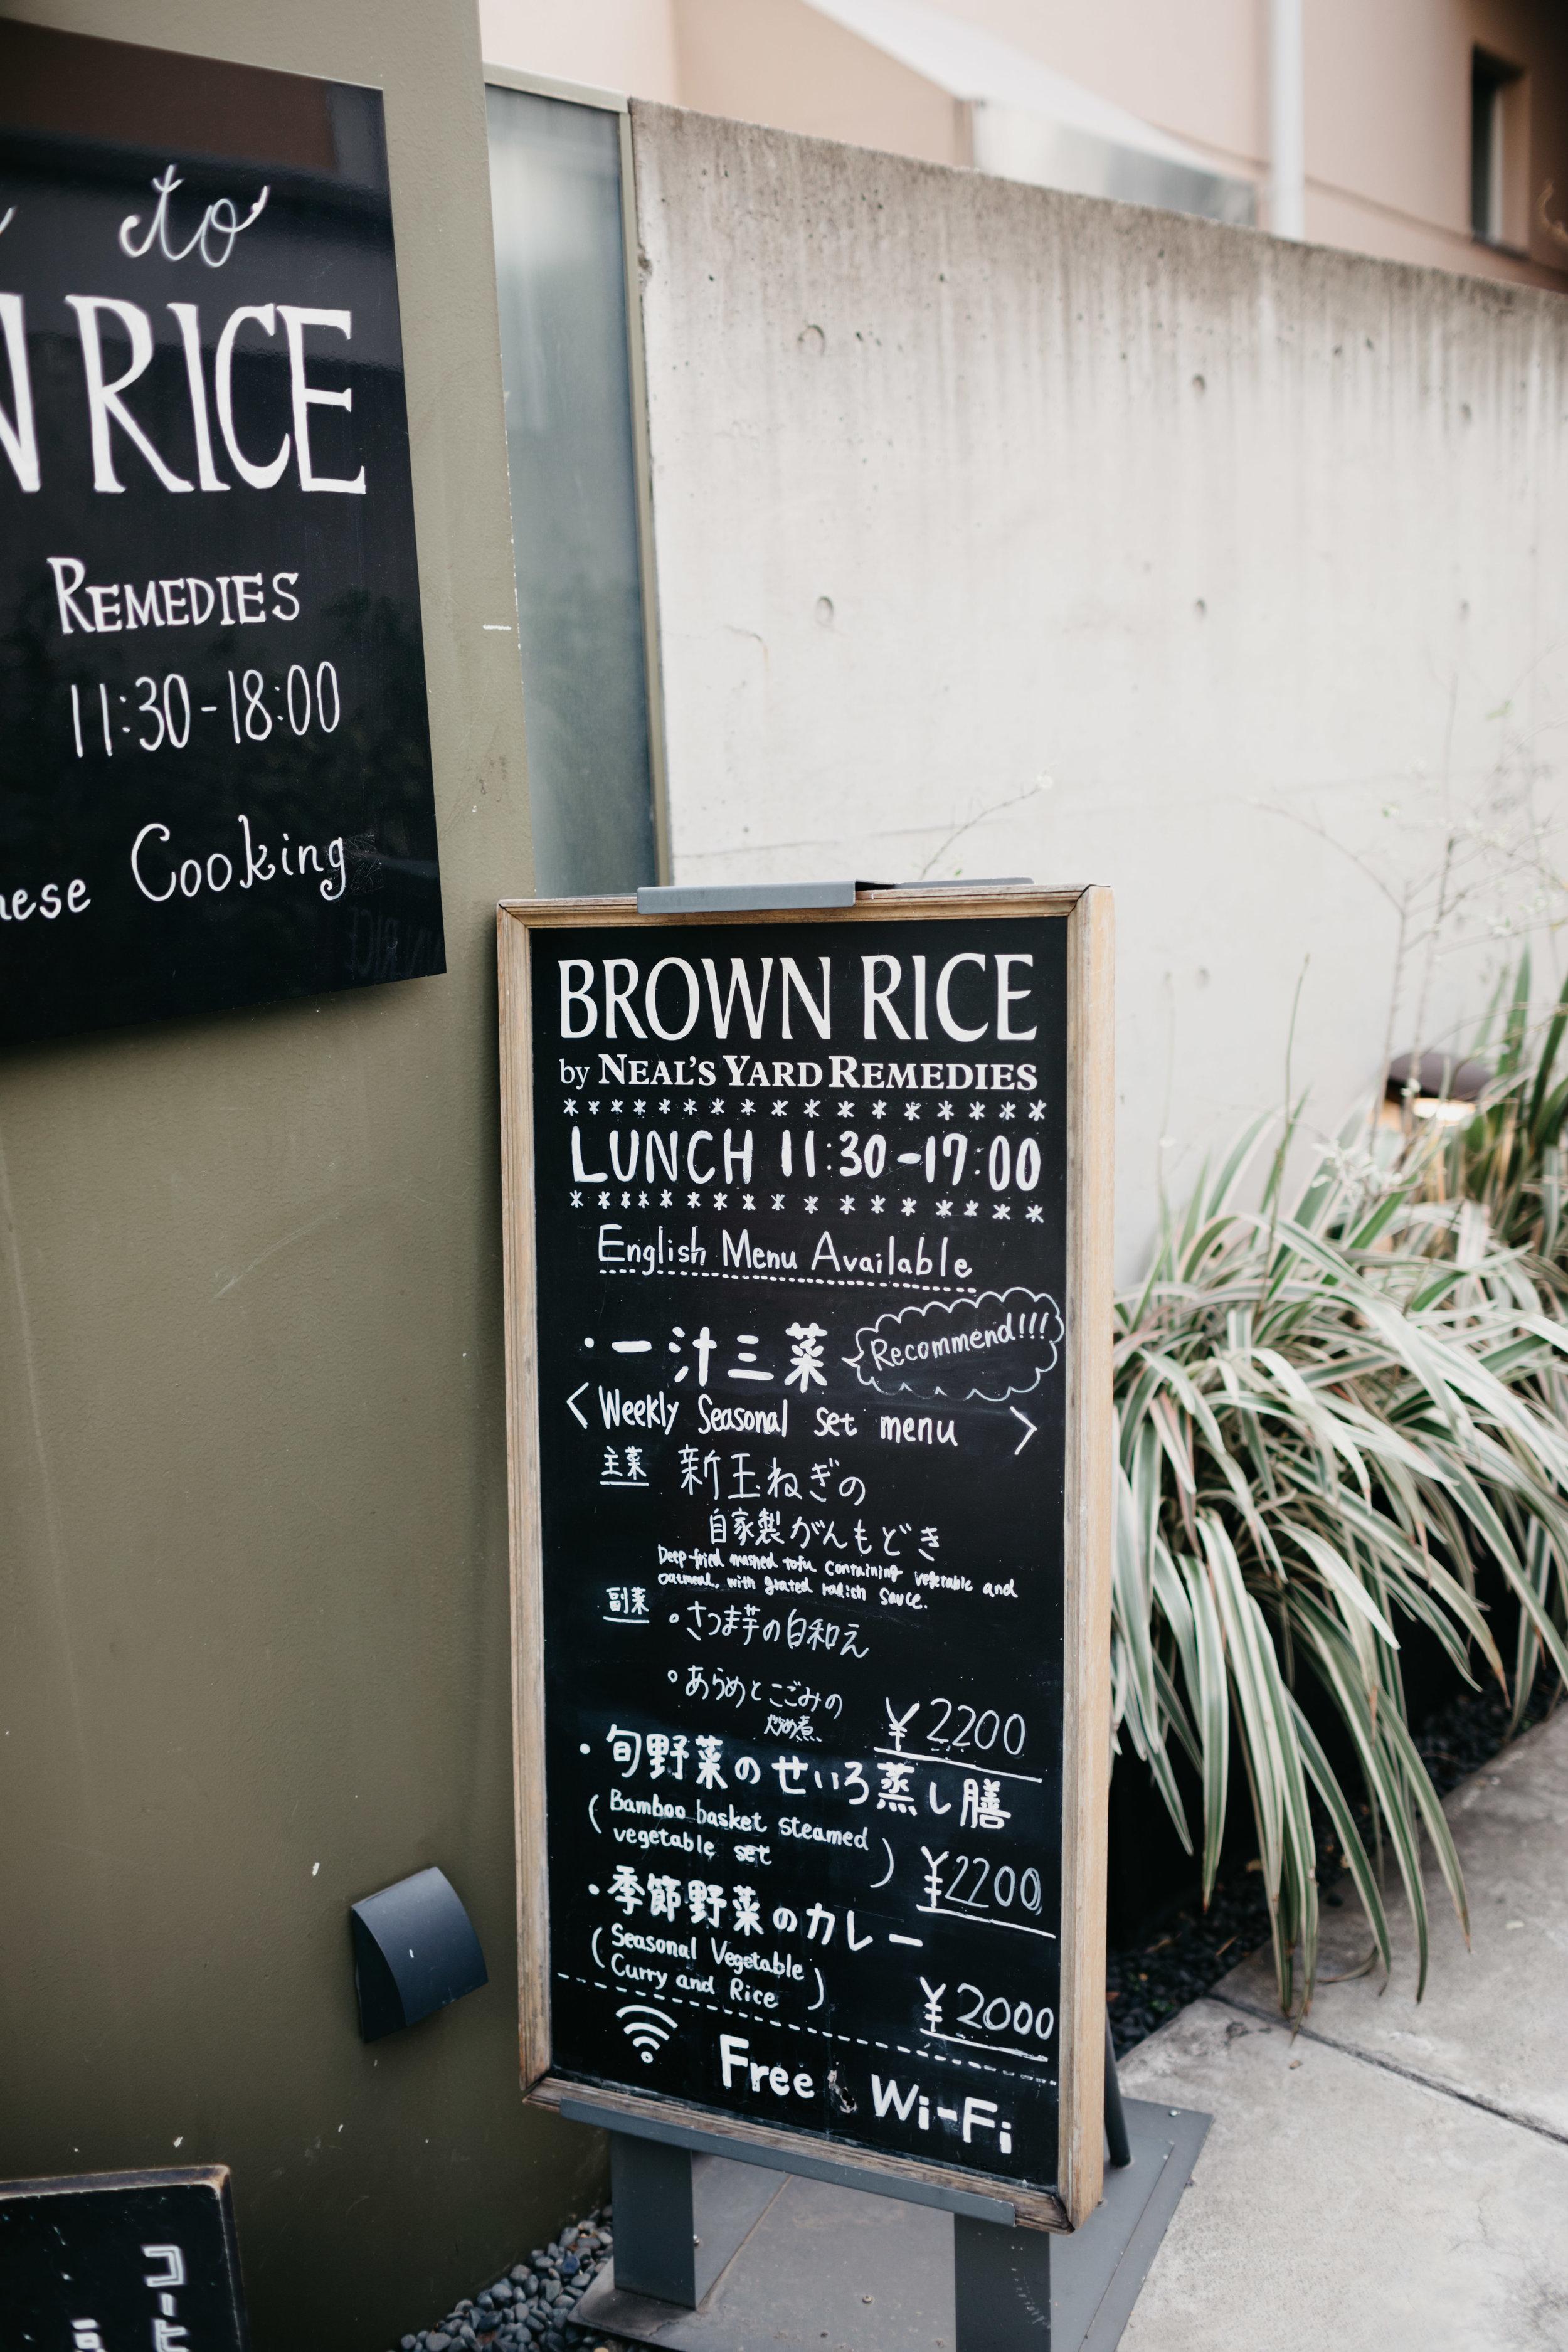 tokyo-vegan-cafe-photo-by-samantha-look.jpg